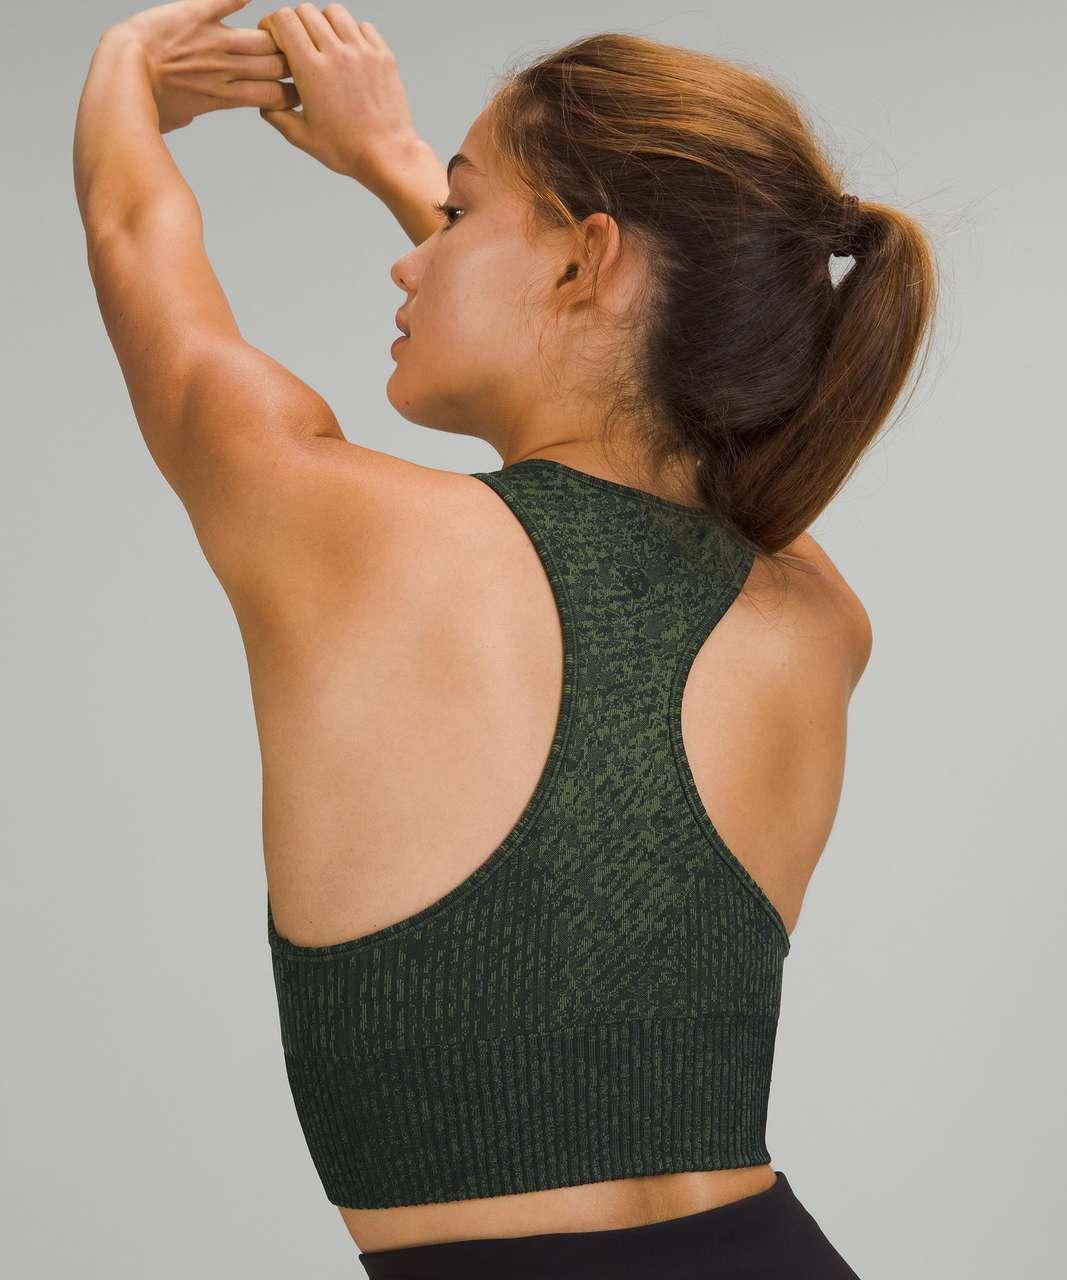 Lululemon Ebb to Train Bra *Medium Support, C/D Cup - Pattern Mix Rainforest Green / Green Twill